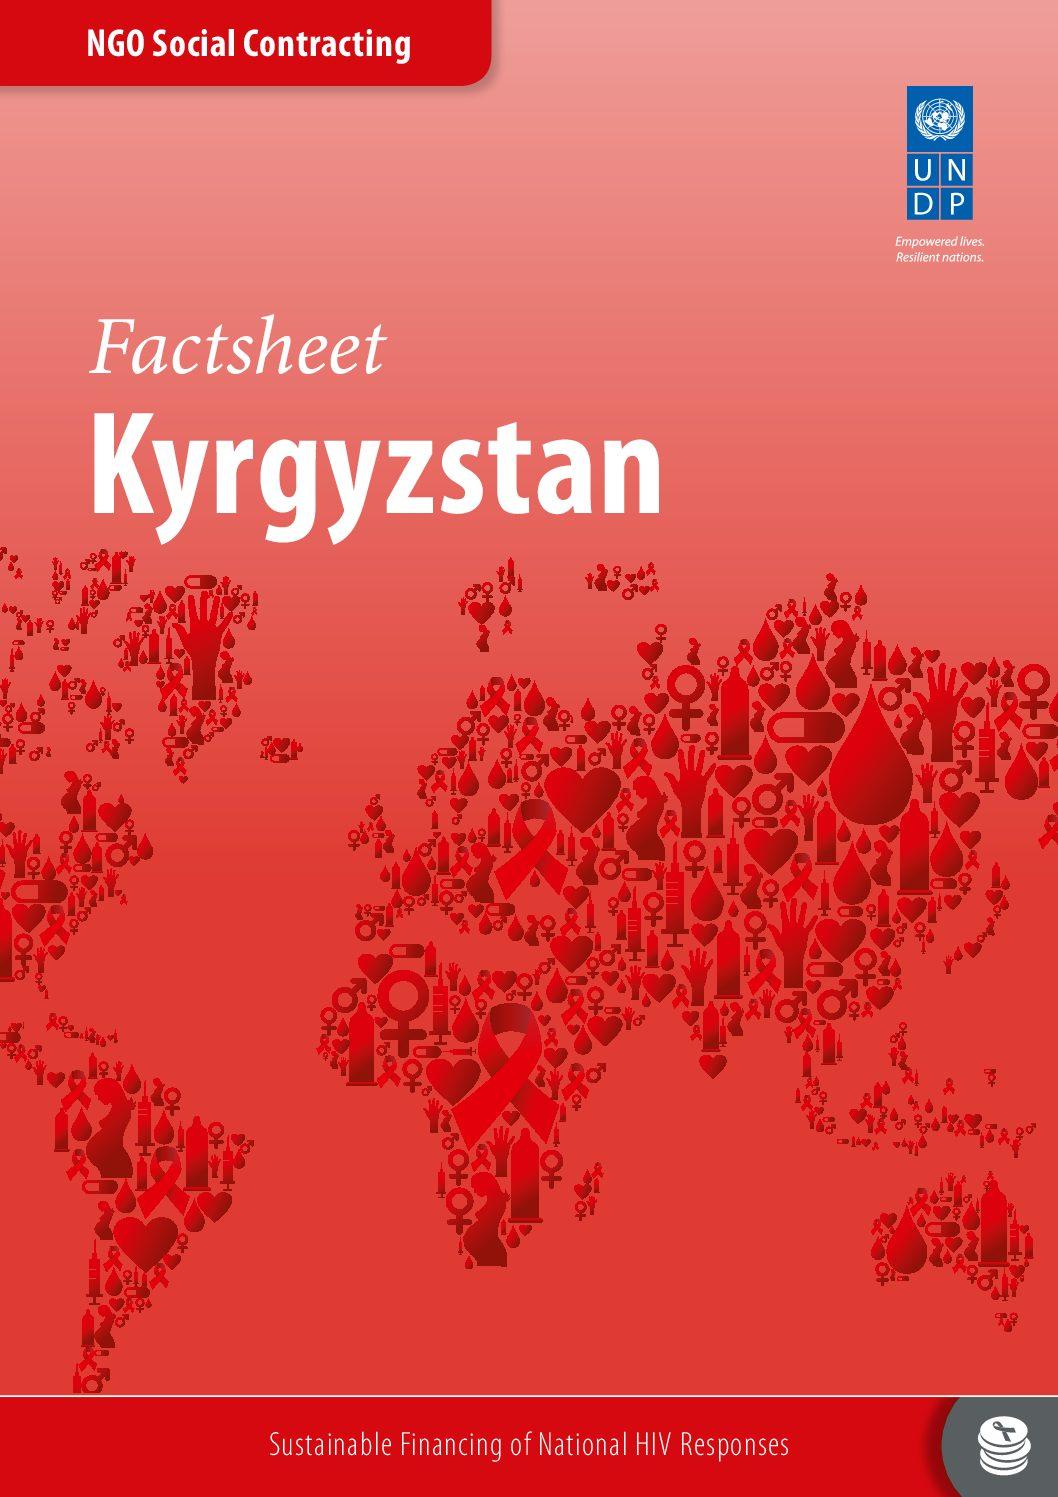 UNDP NGO factsheet Kyrgyzstan.